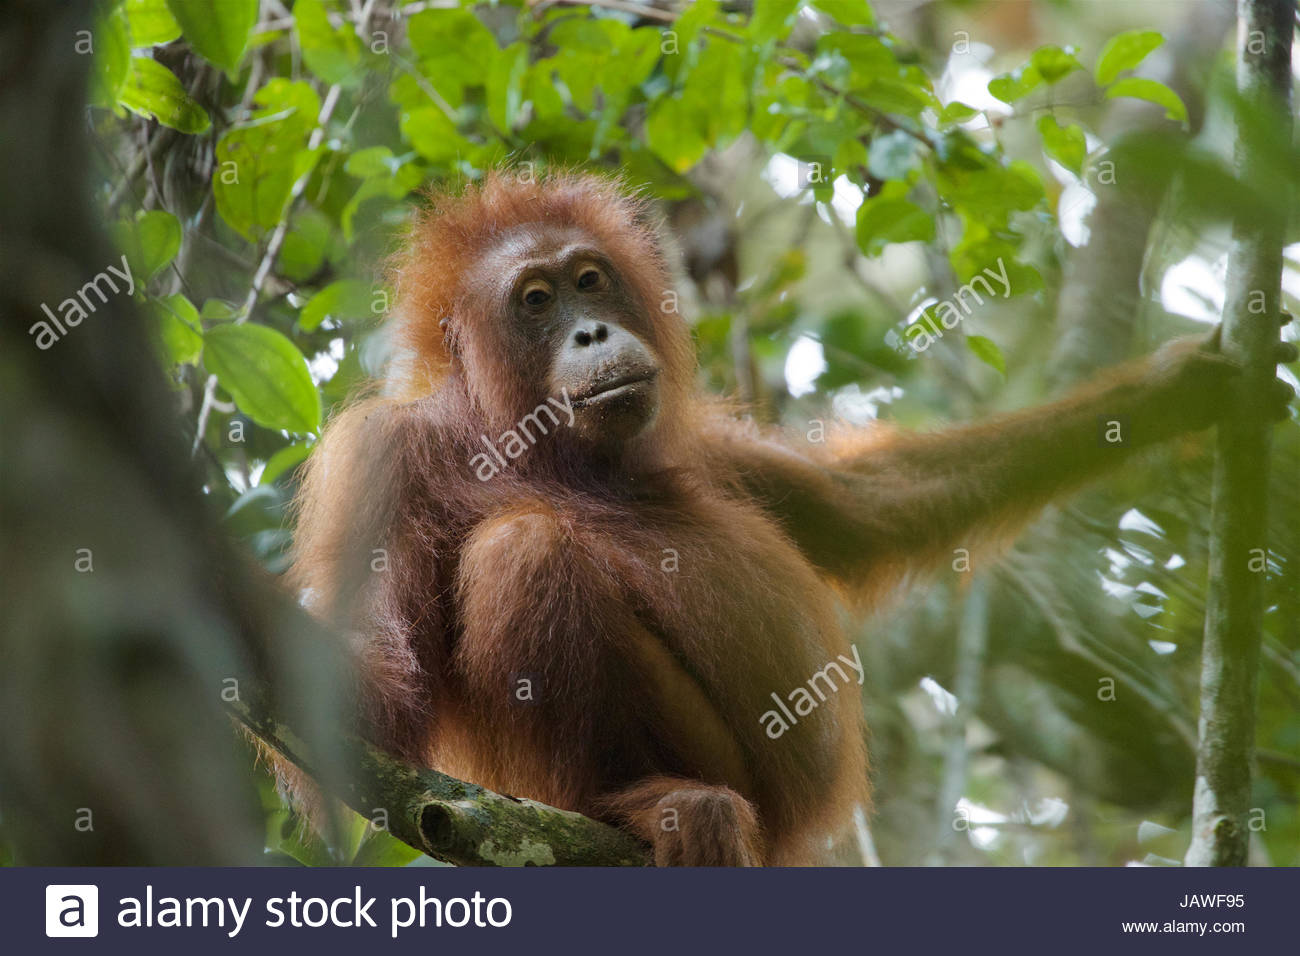 A young Bornean orangutan, Pongo pygmaeus wurmbii, rests in a tree in Gunung Palung National Park. - Stock Image